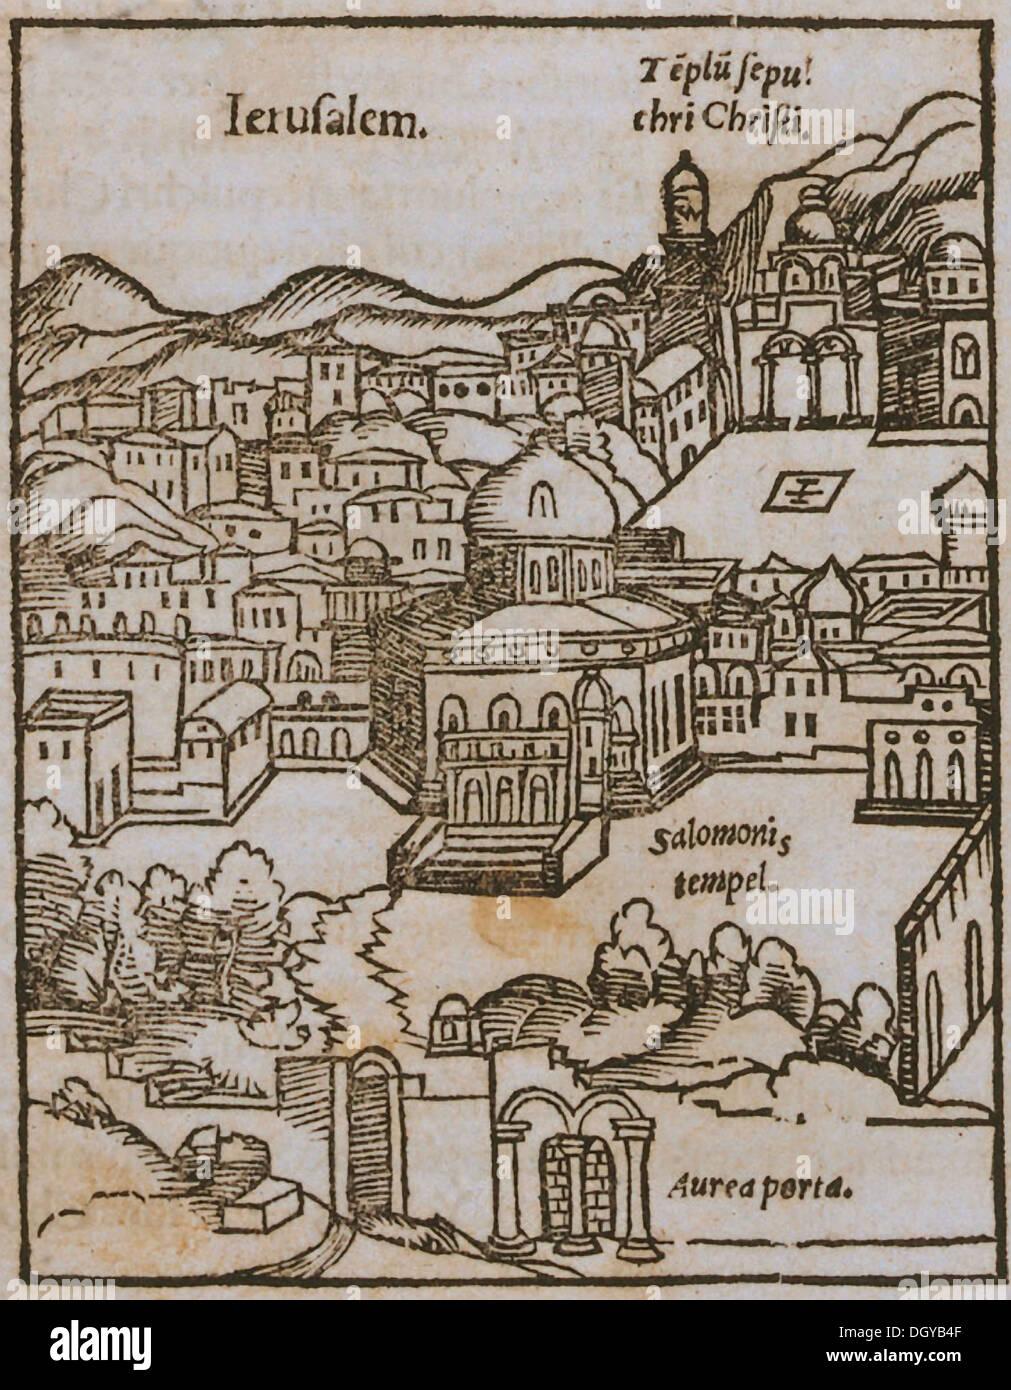 5543. Woodcut map of Jerusalem by Muenster Sebastian, 1489-1552. Temple Mt. in centre - Stock Image